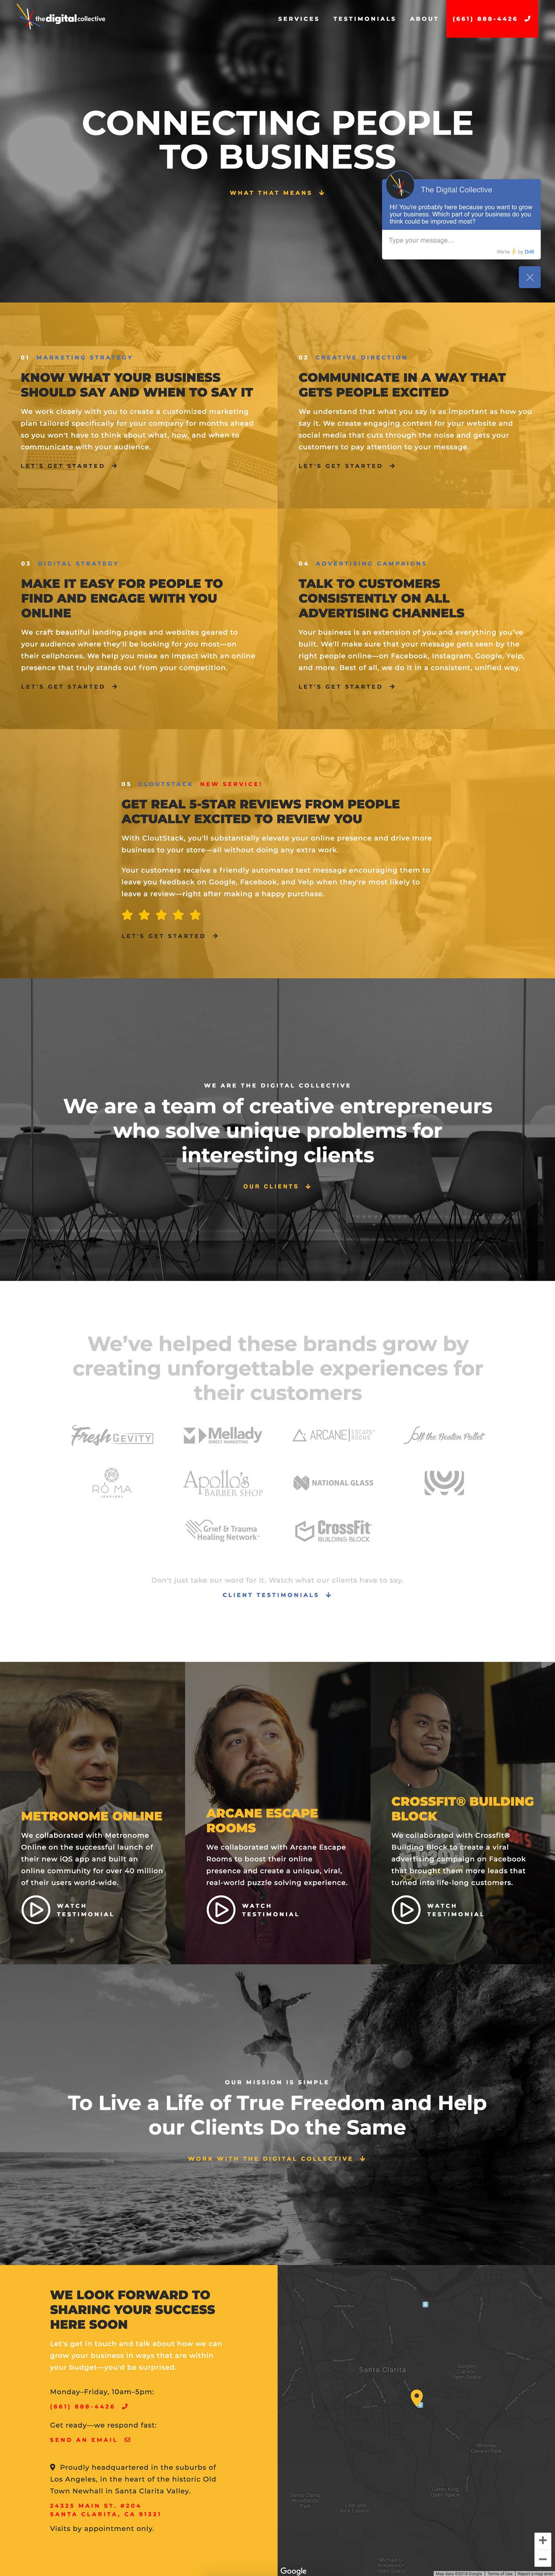 Landing Page design for a digital marketing agency.